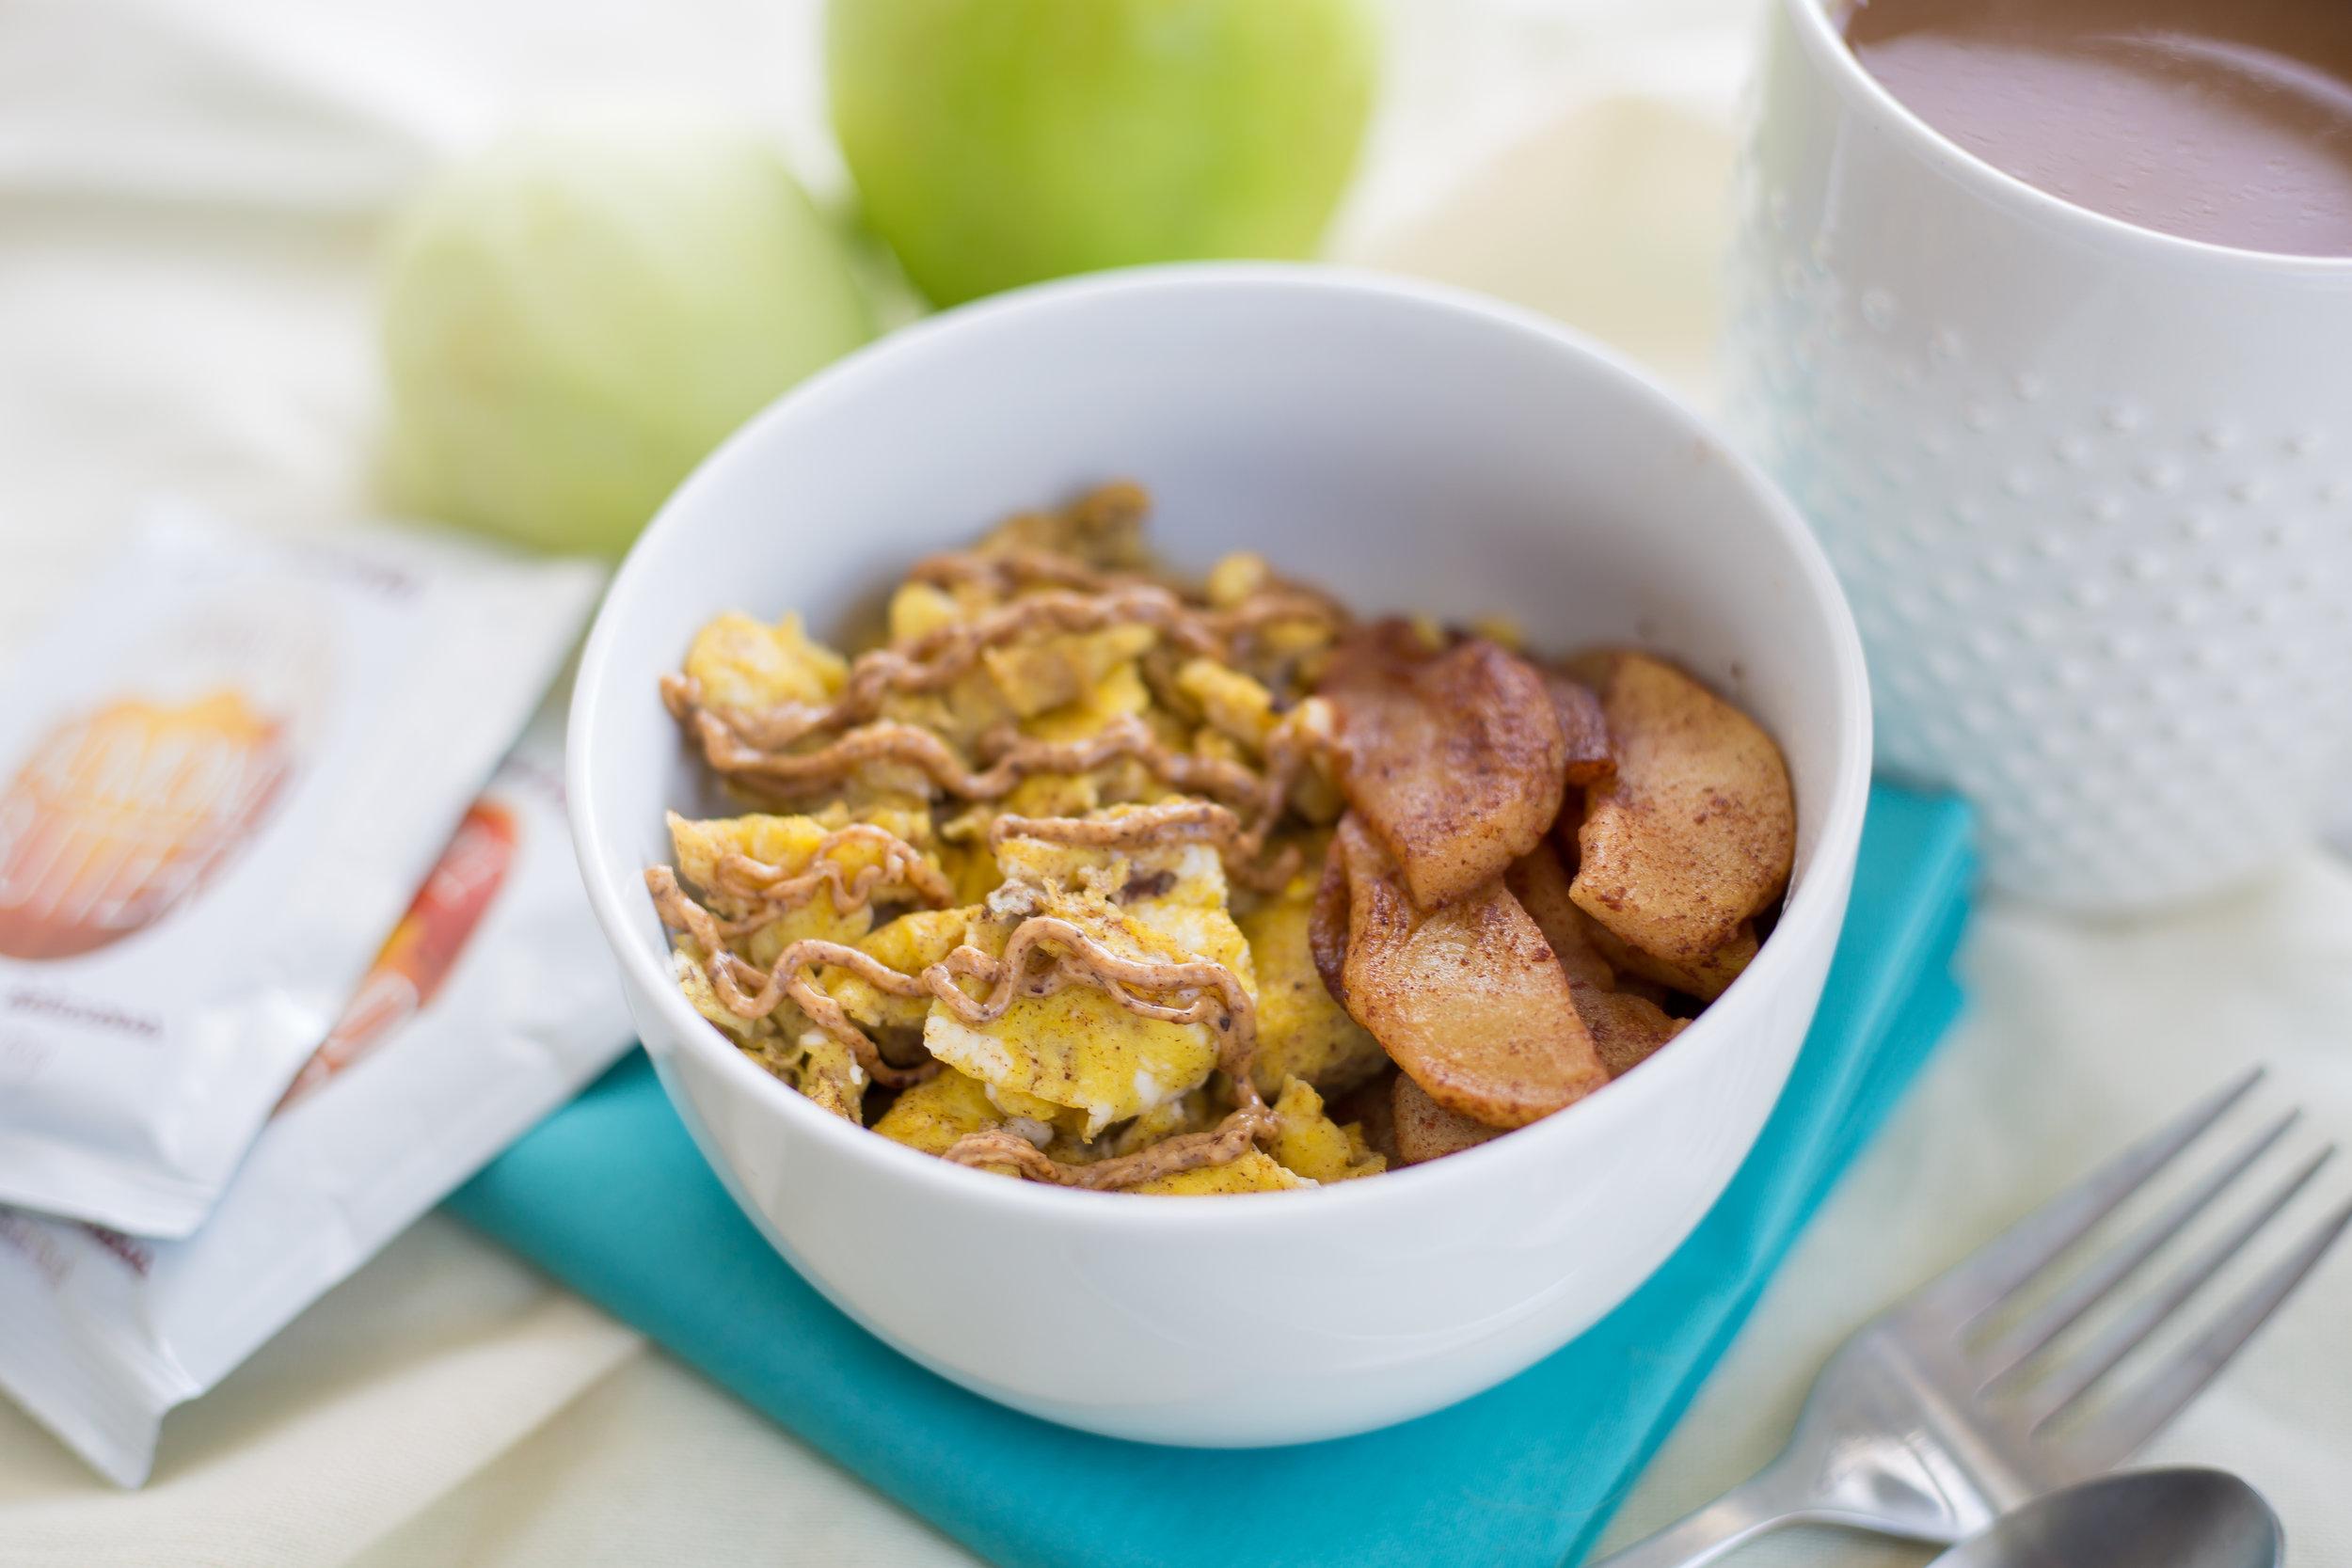 Apple Cinnamon Scramble, Breakfast, 21DSD Breakfast, Easy Recipes, Healthy Recipes, Grain Free, Gluten Free, Dairy Free, Delicious,